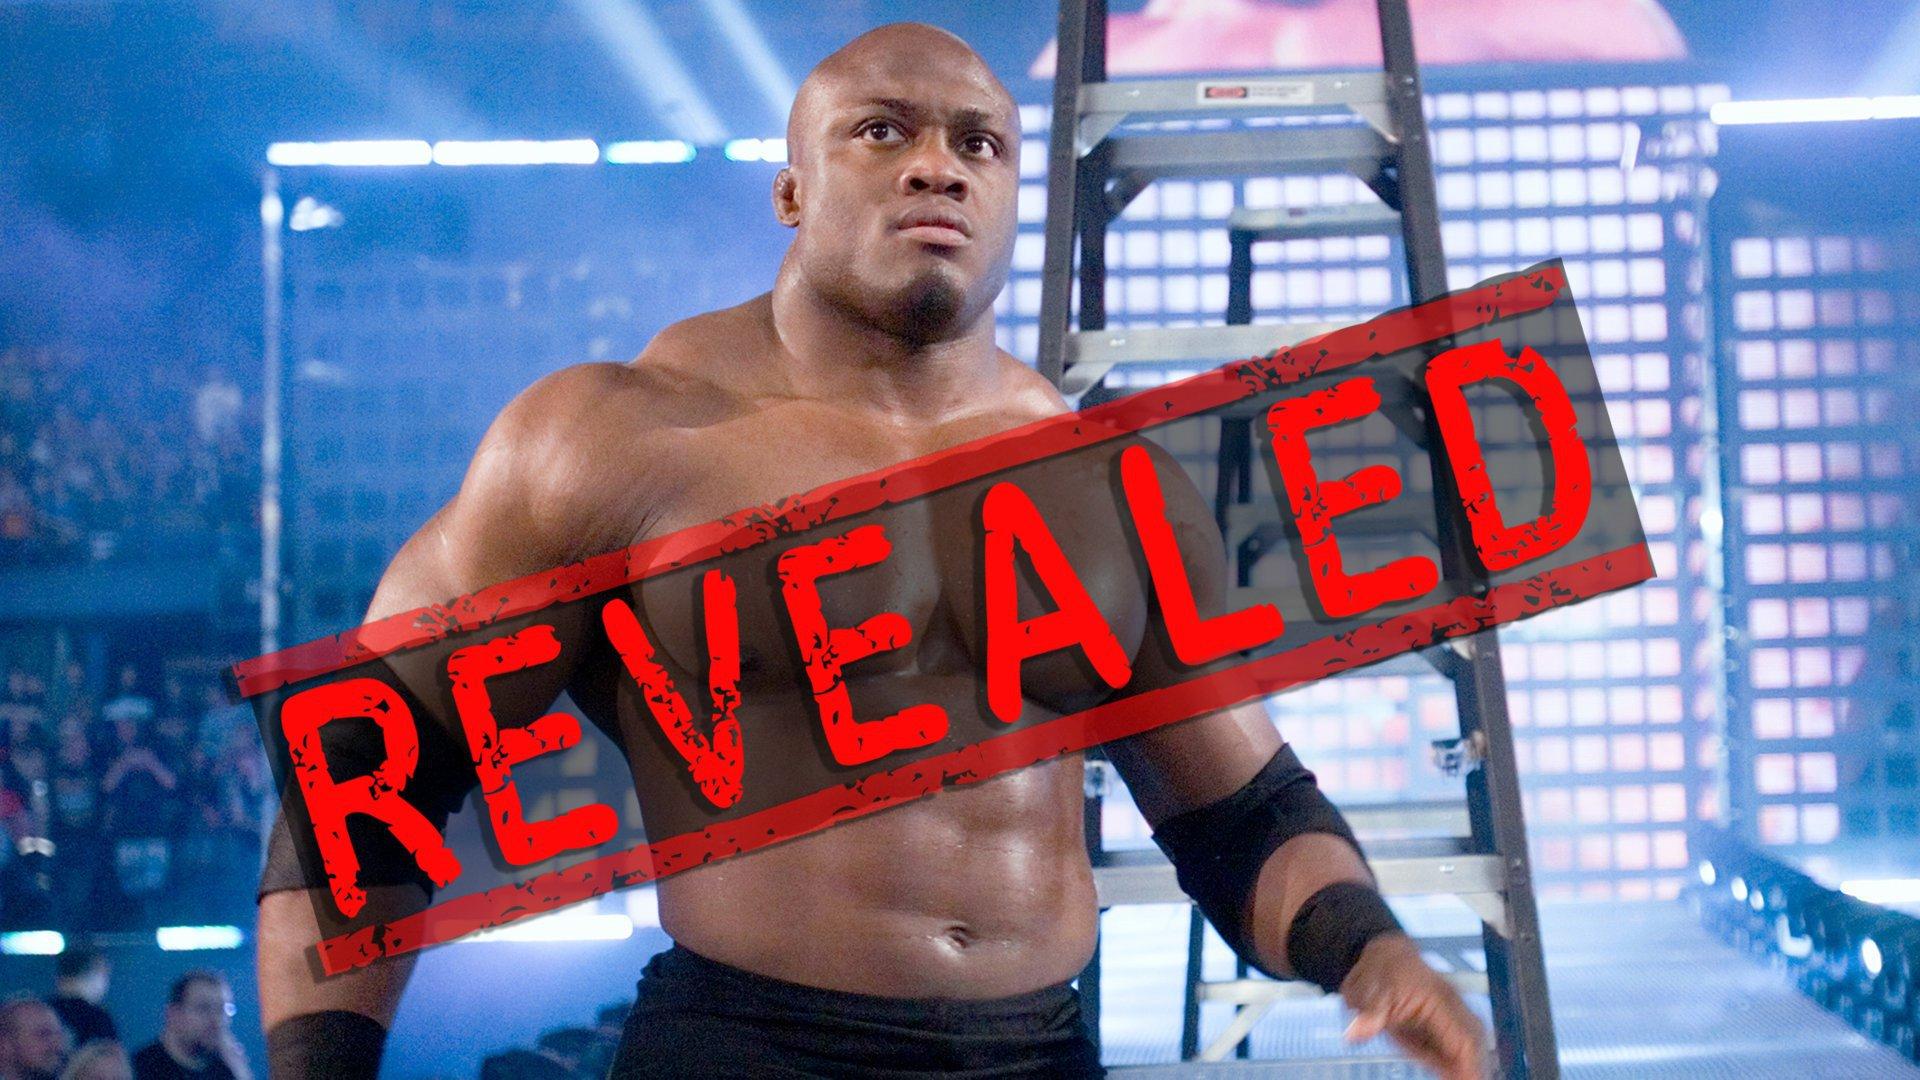 What's Wrong With This Video? - Le Match d'Échelles Money in the Bank de WrestleMania 22 - Révélation